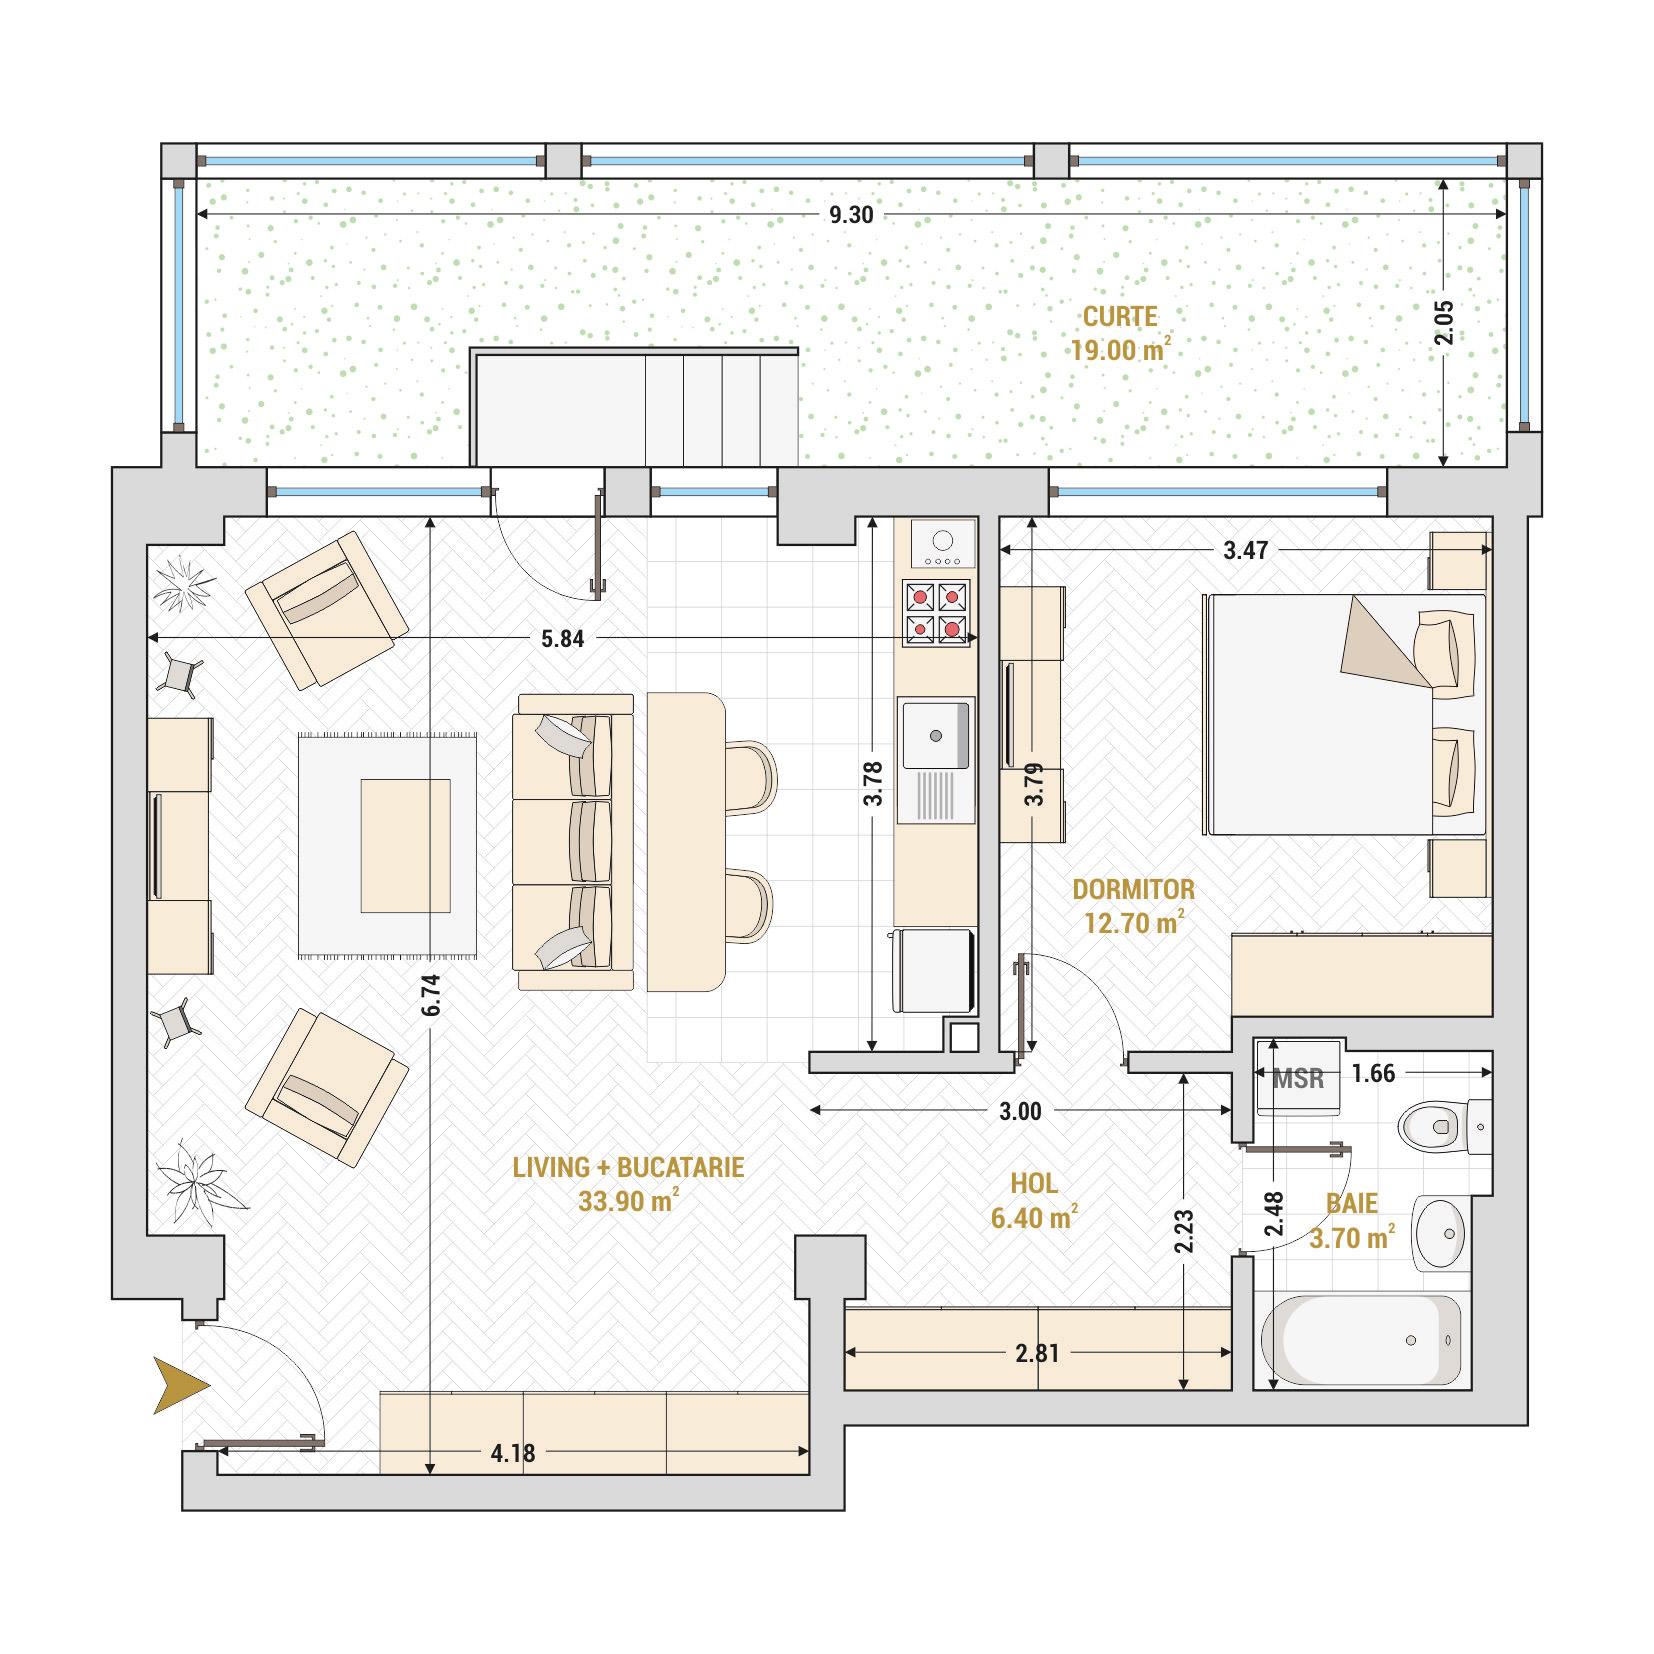 Apartament 2 camere de vanzare Bucuresti - Catedral Residence - Marriott, Piata Unirii, 13 Septembrie, Izvor - Tip 7 - T1